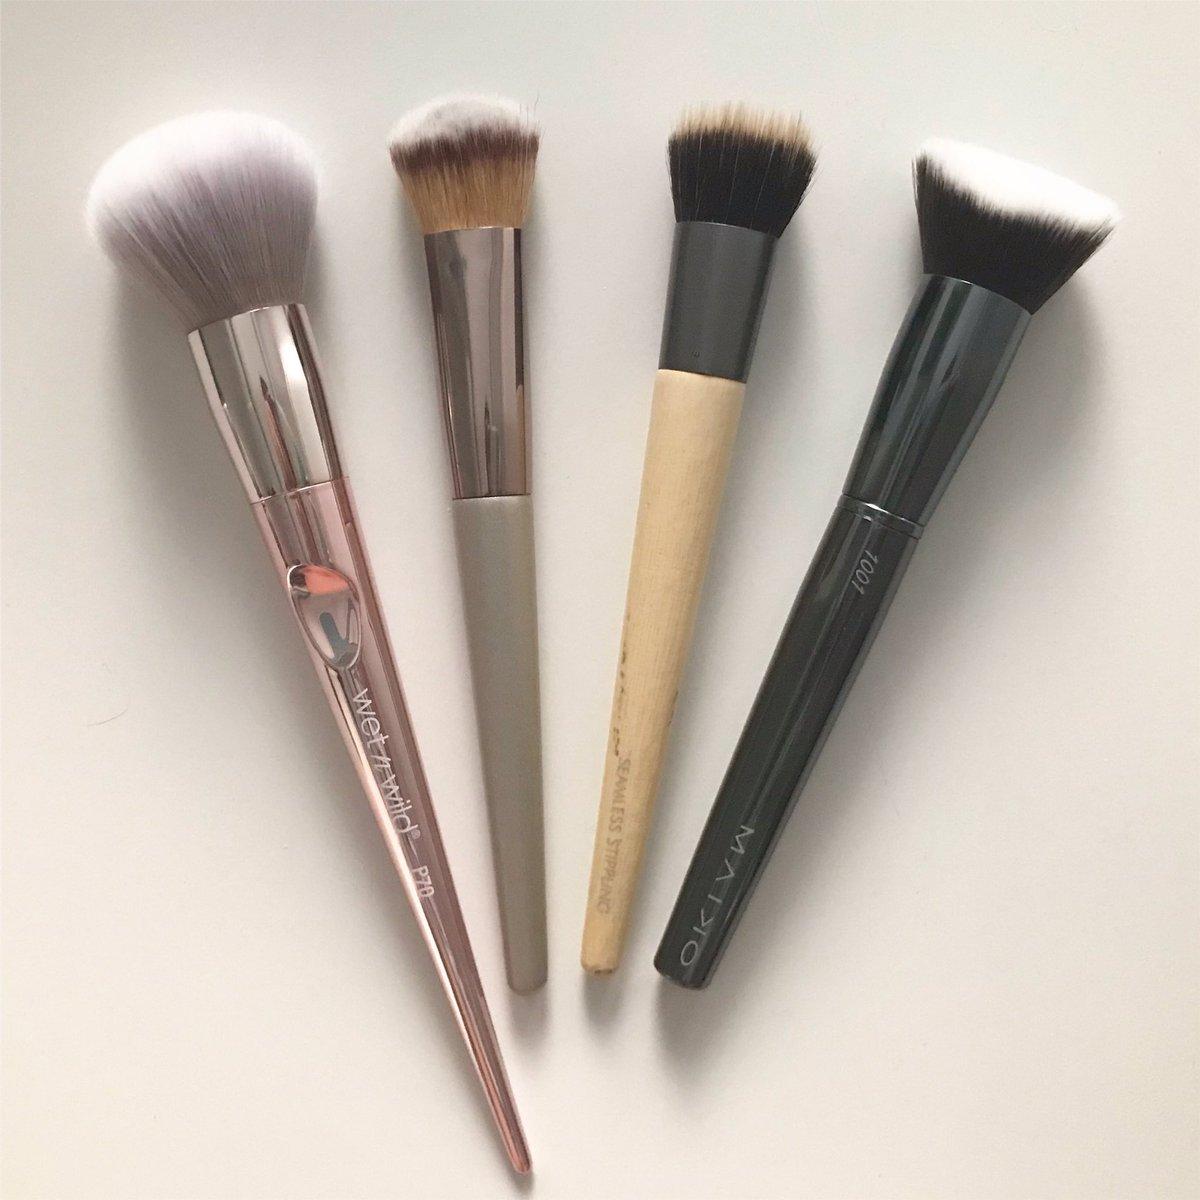 Para aplicar los productos que os enseñé ayer, usé estas 4 brochas.  Como veis, gran variedad de marcas  ¿Tenéis alguna de ellas? #makeupbrushes #makeup #beautyblogger #makeupblogger #beautypic.twitter.com/77DVtgOqjW